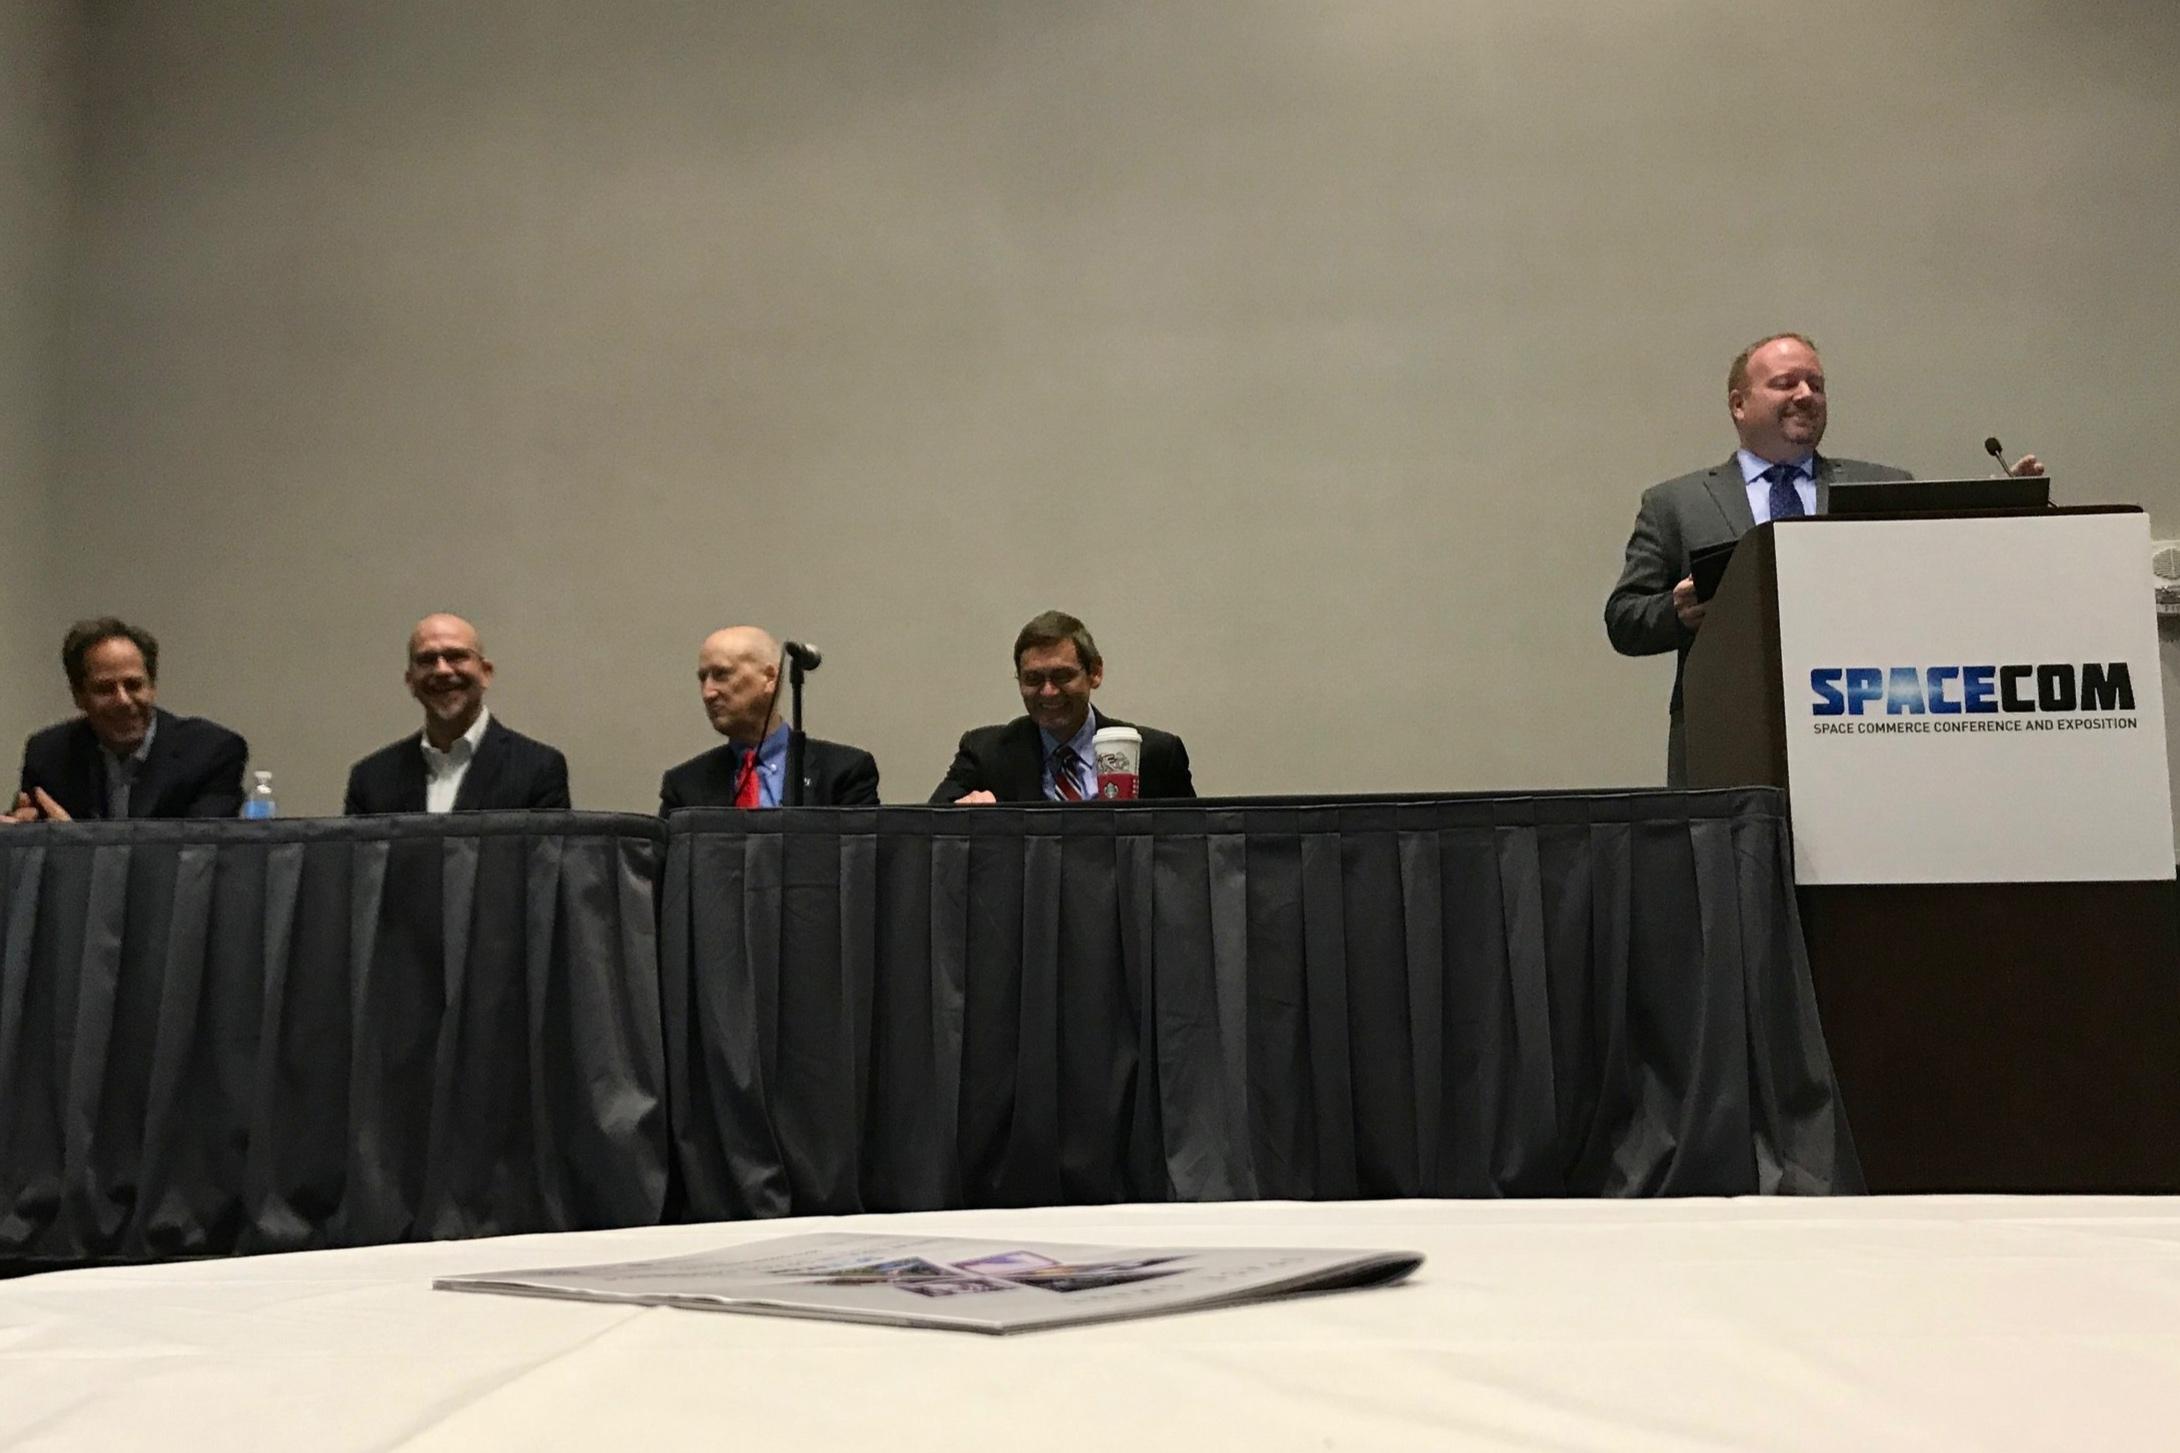 SpaceCom 2017 - Working in Space panel. Host Jason Crusan (NASA Advanced Exploration Systems) introduces panelists - Jeffrey Manber (NanoRacks), Barton Bollfrass (Opifex Global), Robert Richards (Orbital ATK),and John Elbon (Boeing).